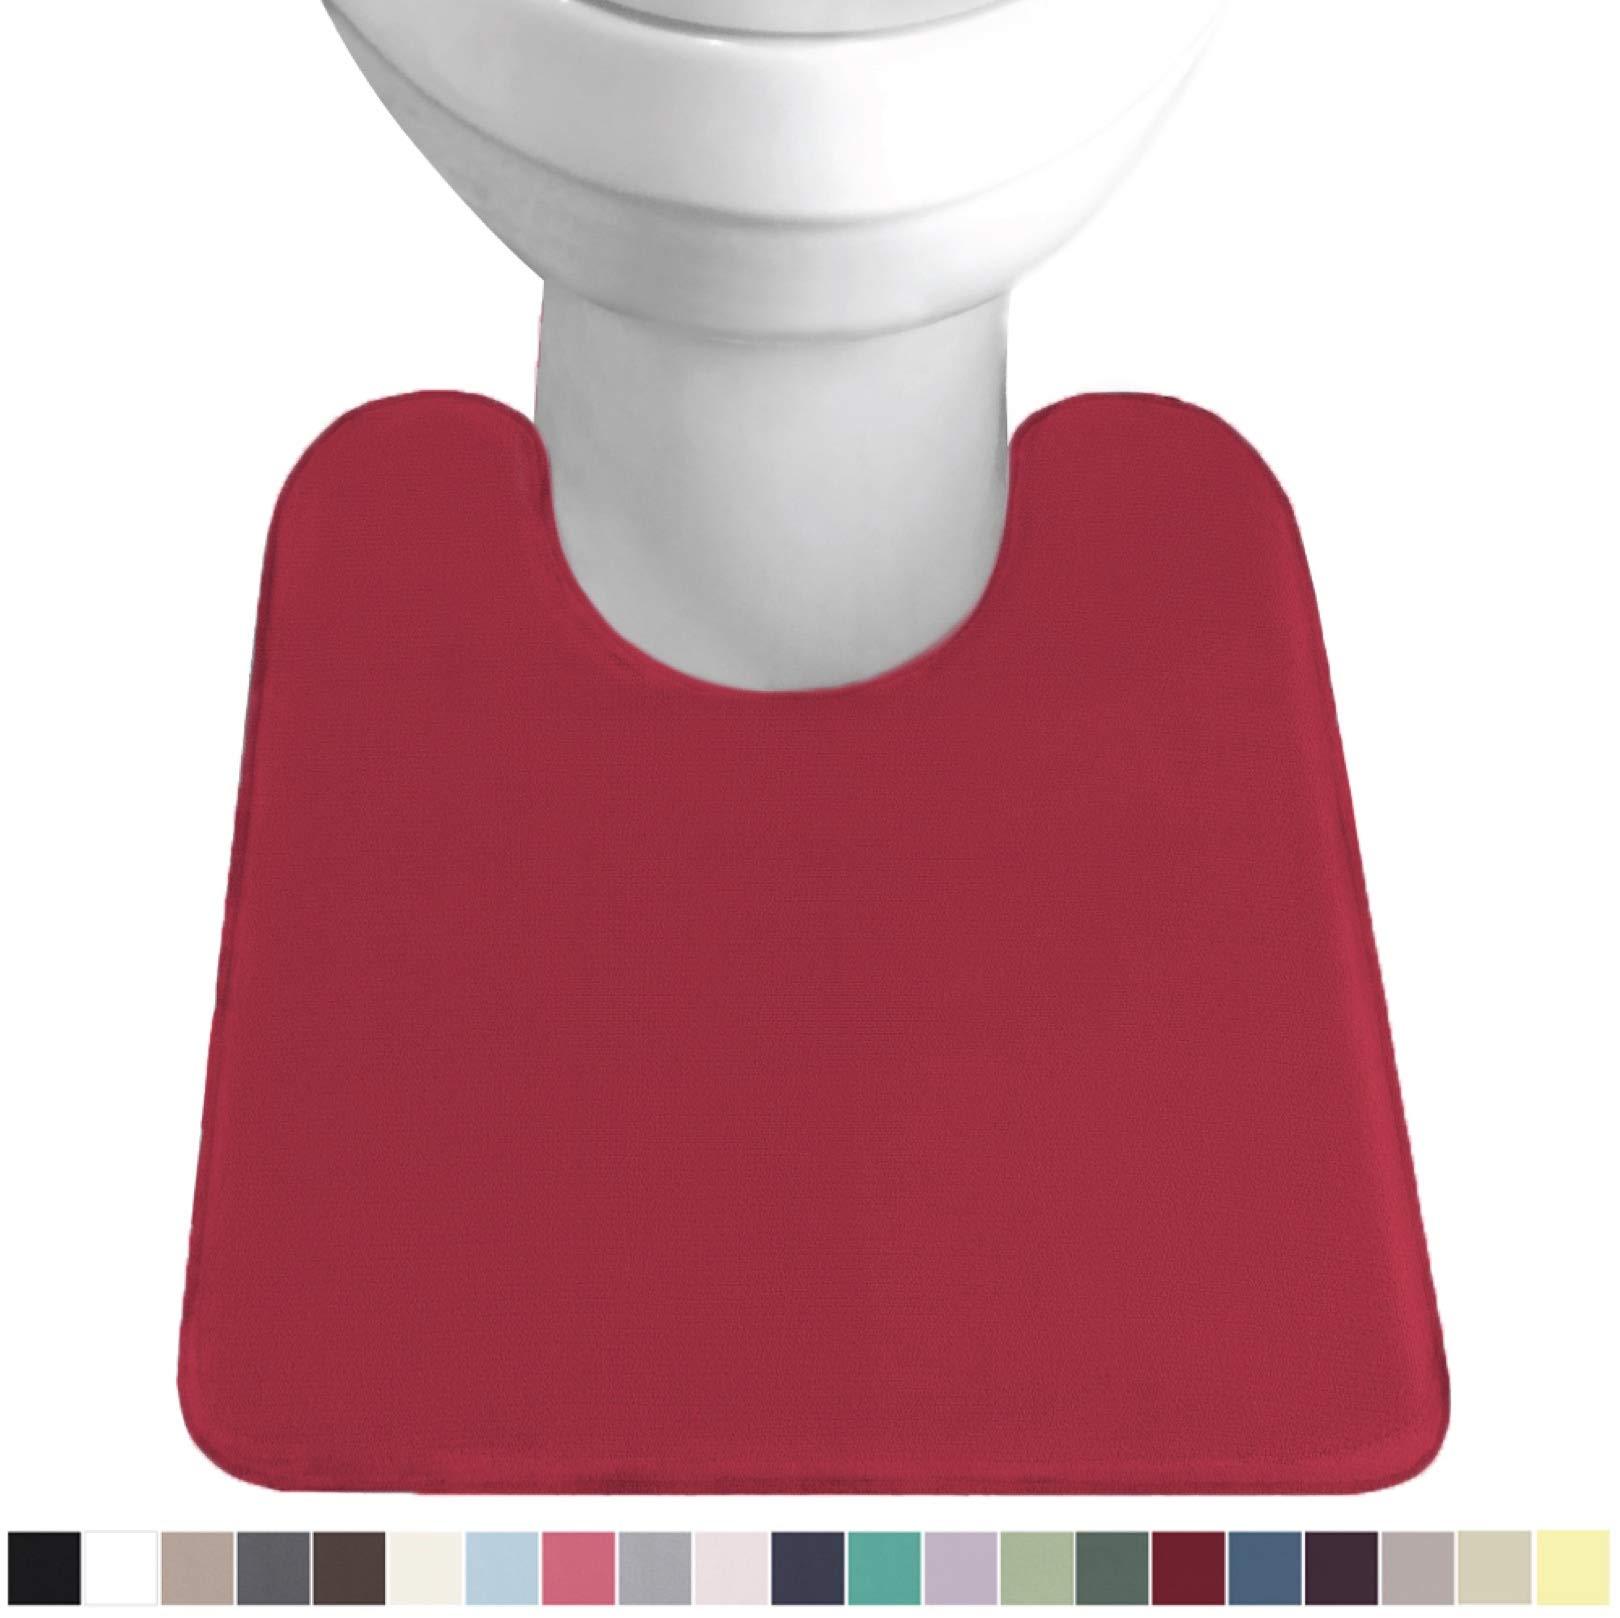 Gorilla Grip Original Thick Memory Foam Contour Toilet Bath Rug 22.5x19.5, U Shape, Cushioned, Soft Floor Mats, Absorbent Cozy Bathroom Rugs, Machine Wash and Dry, Plush Bath Room Carpet, Red